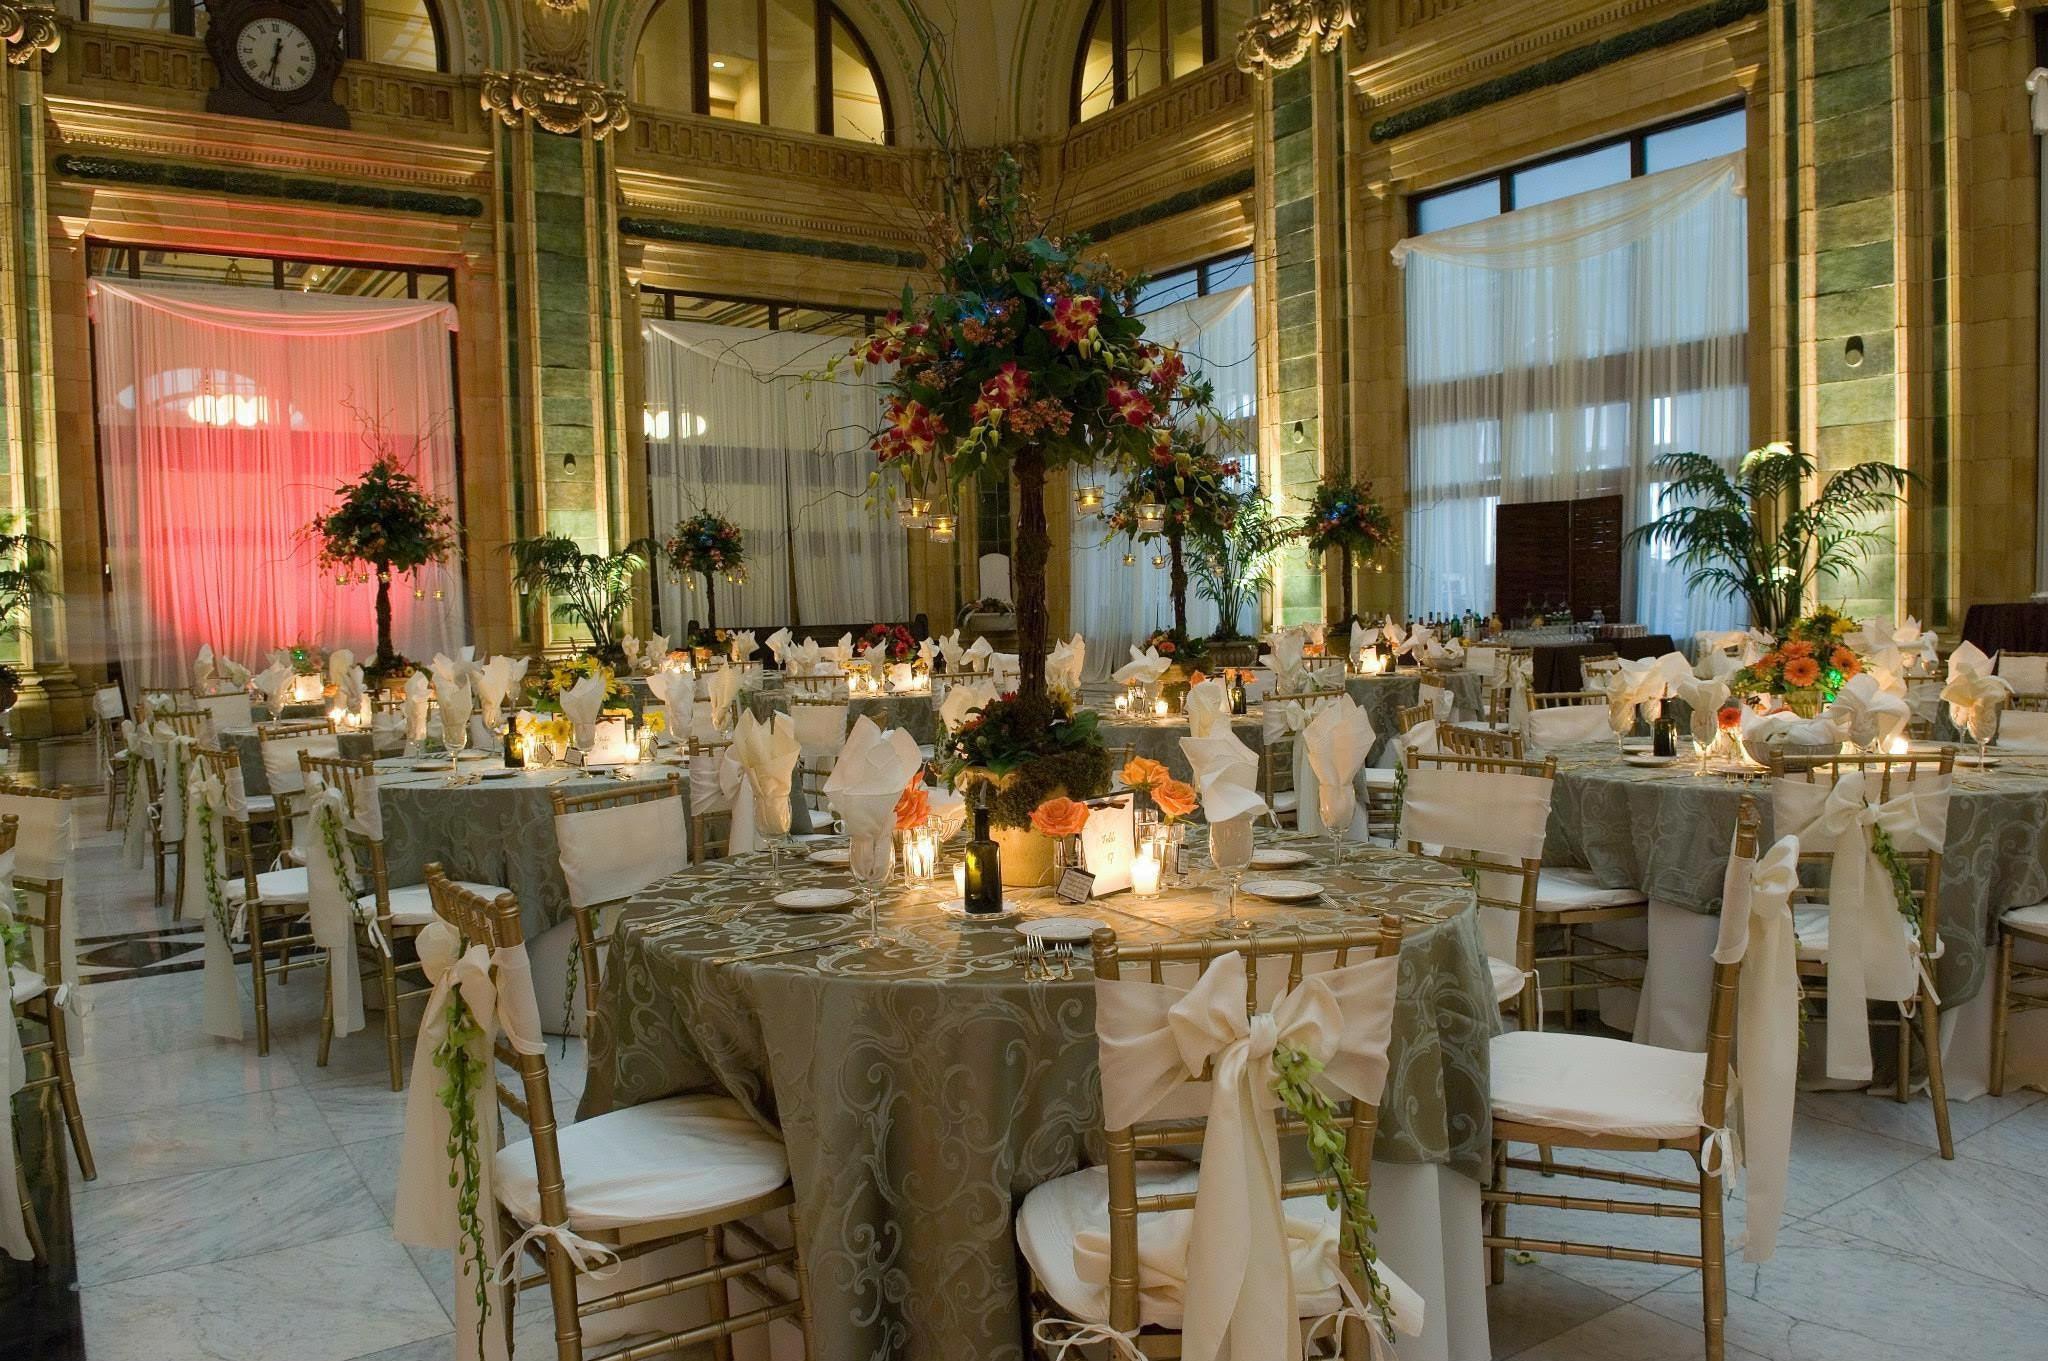 pa-wedding-linens-80.jpg